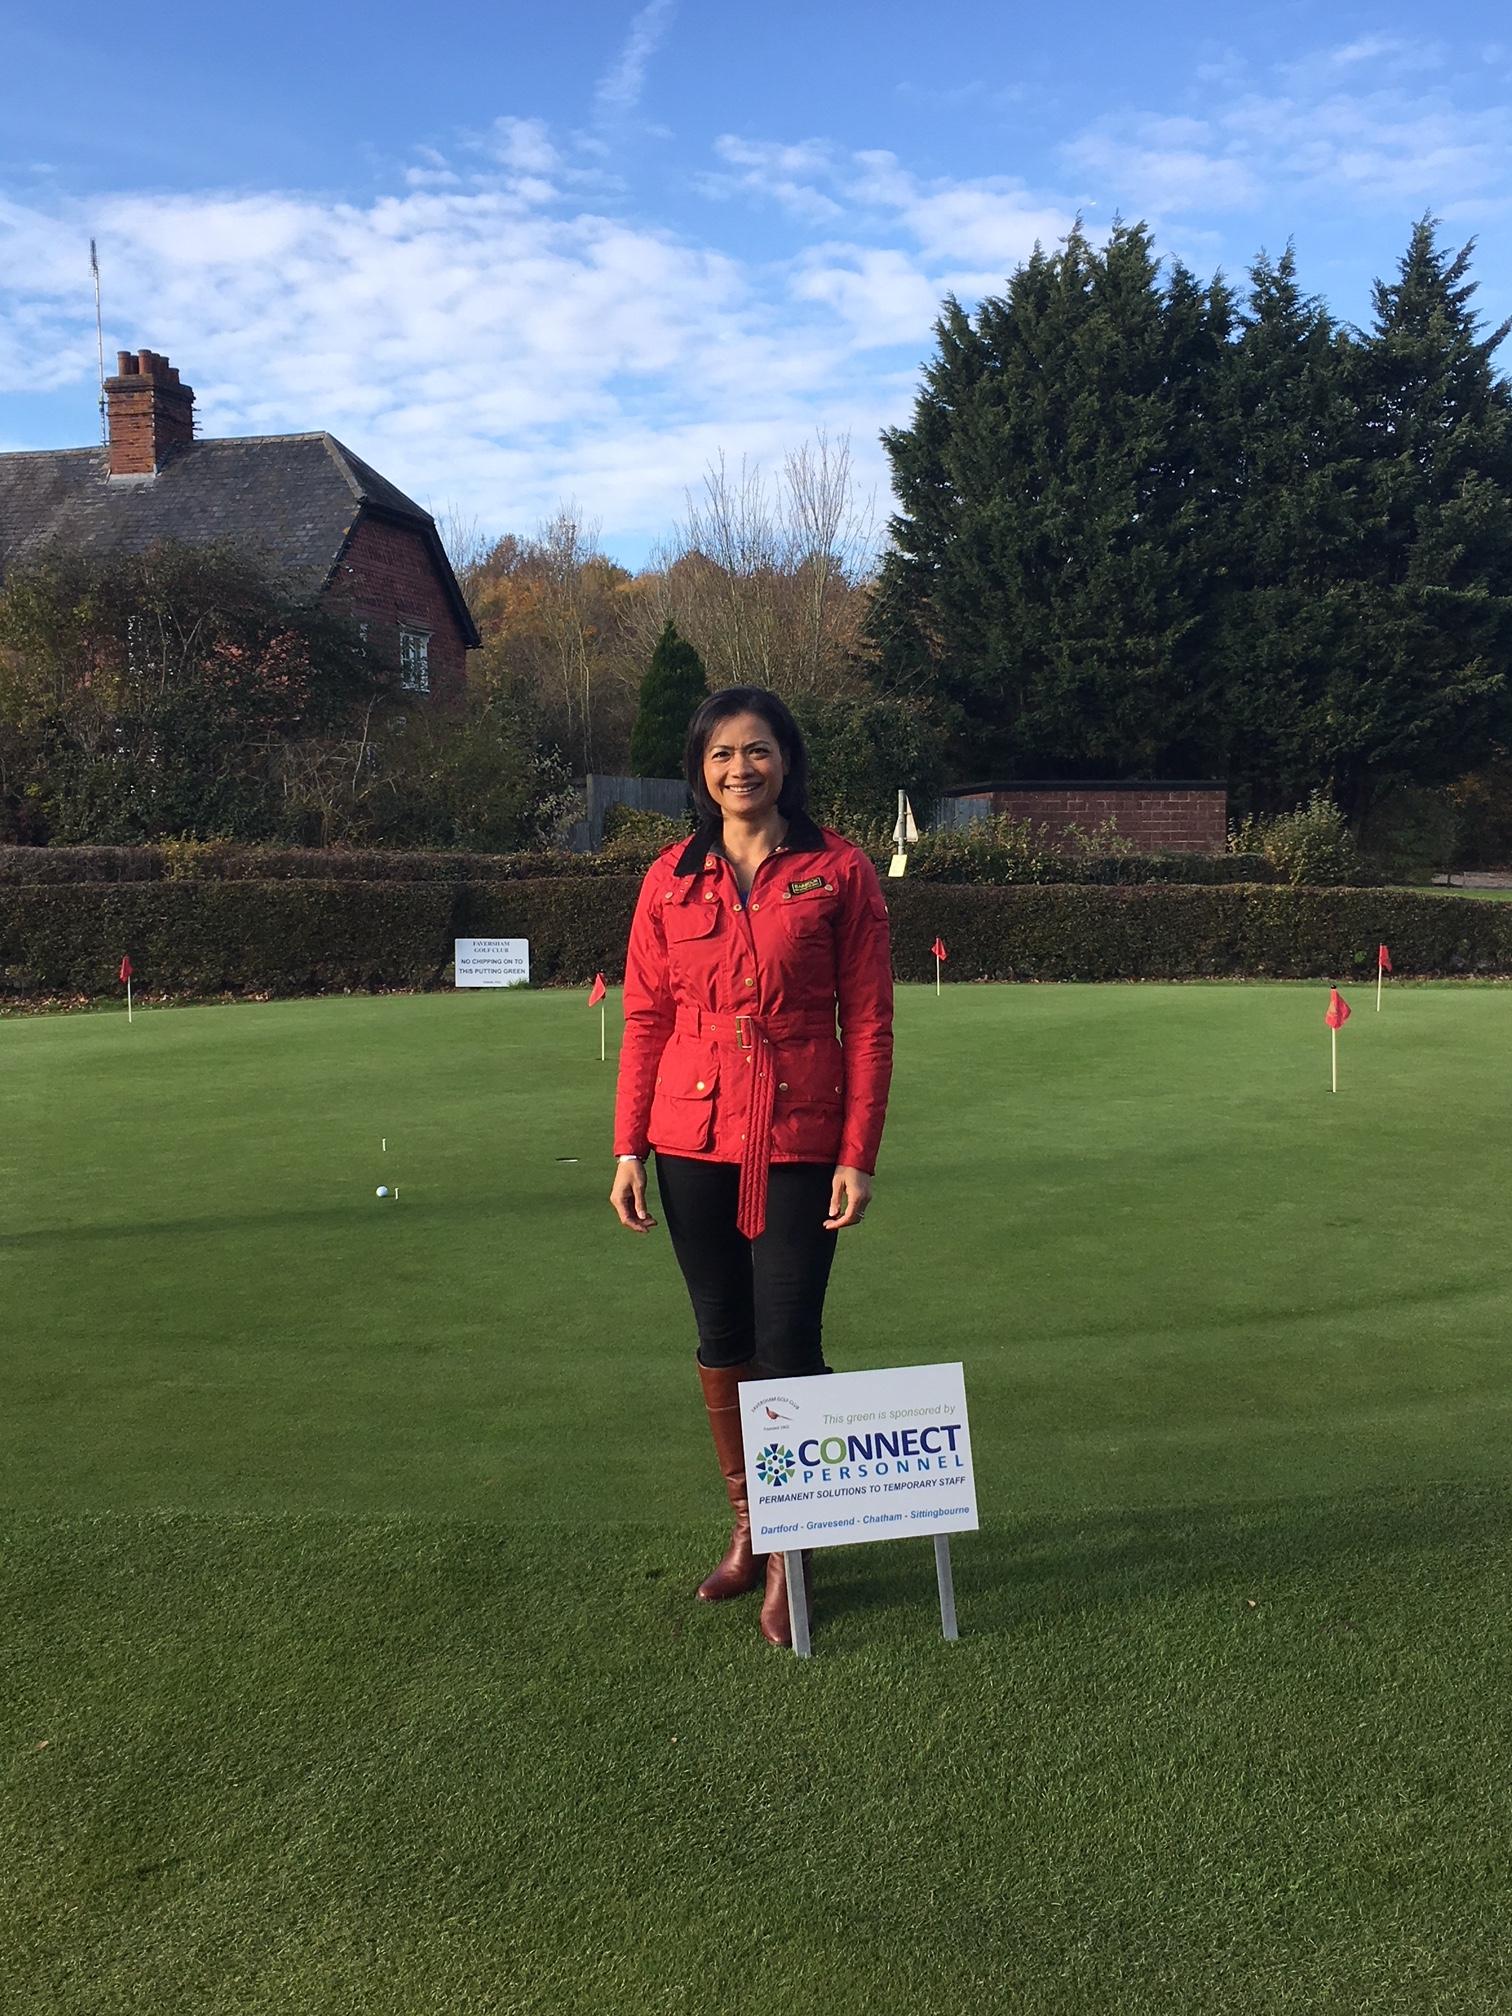 Proudly sponsoring Faversham Golf club